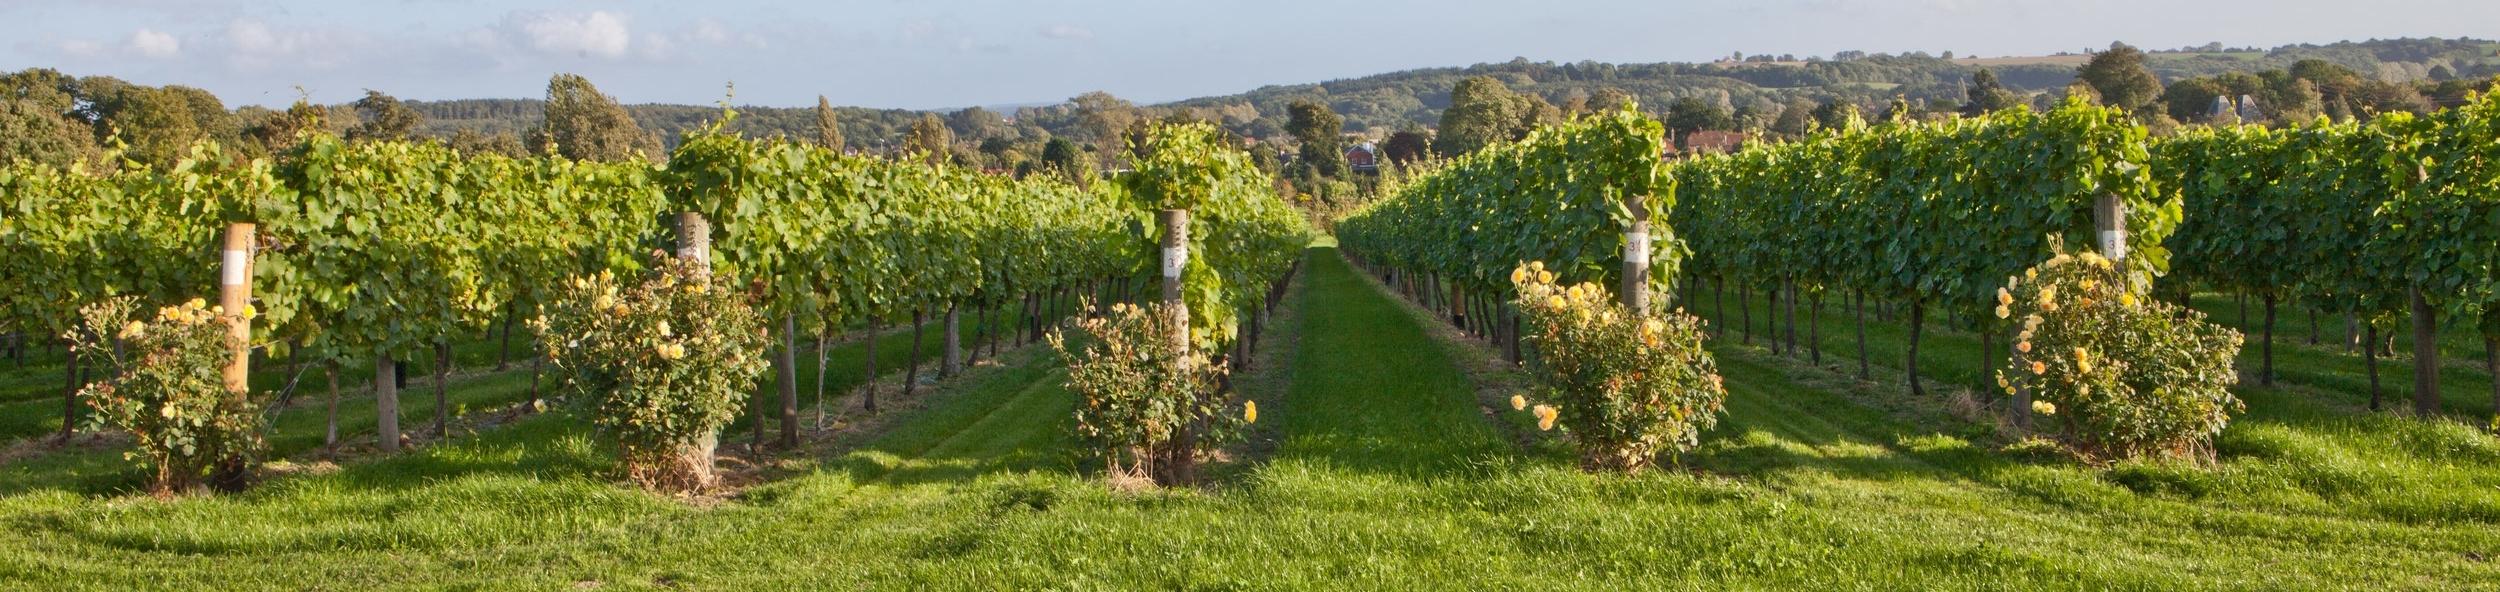 Vine Landscape.jpg